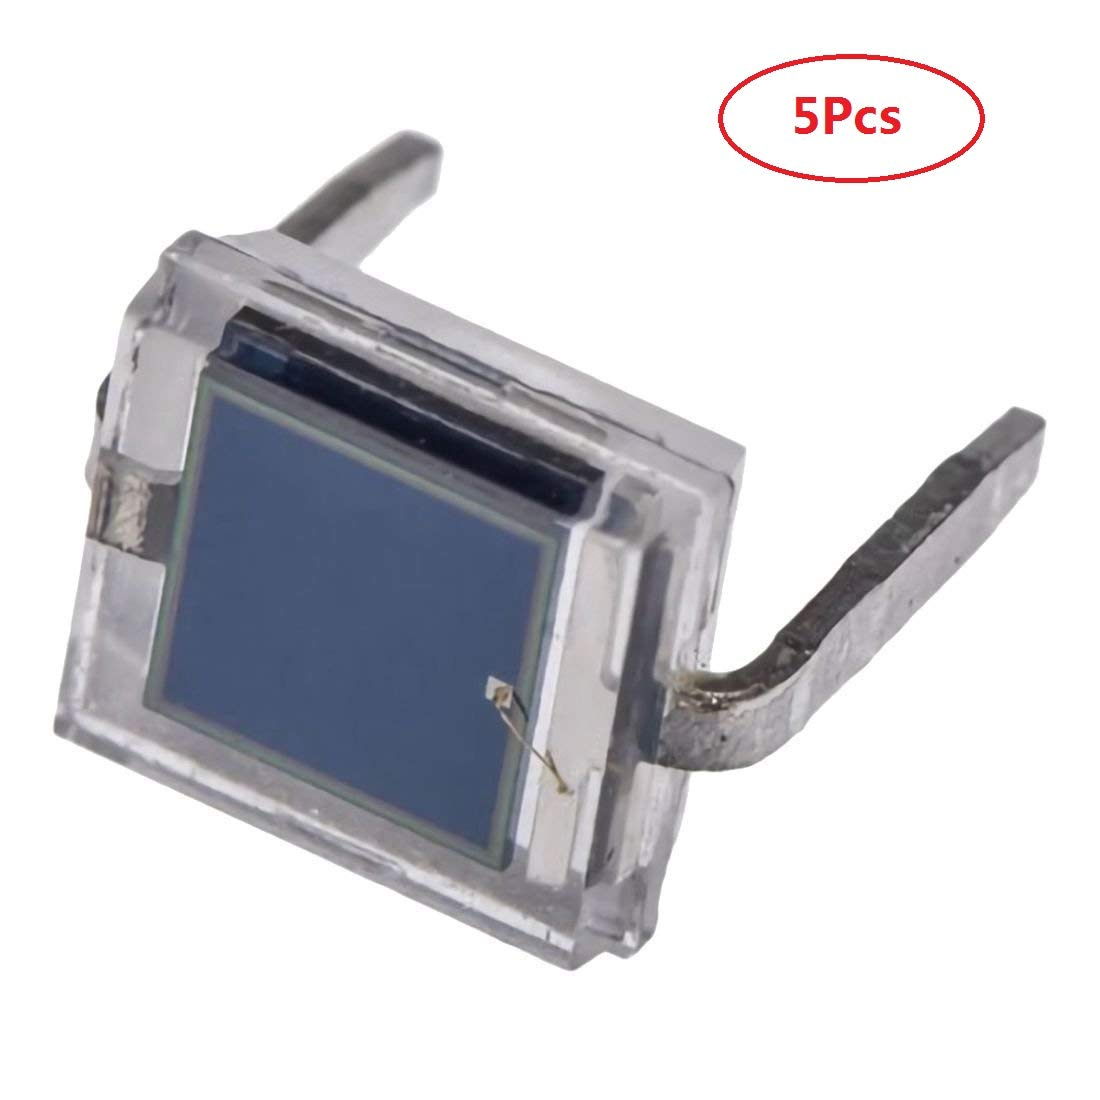 5pcs NEW BPW34 Silicon PIN Photodiode DIP-2